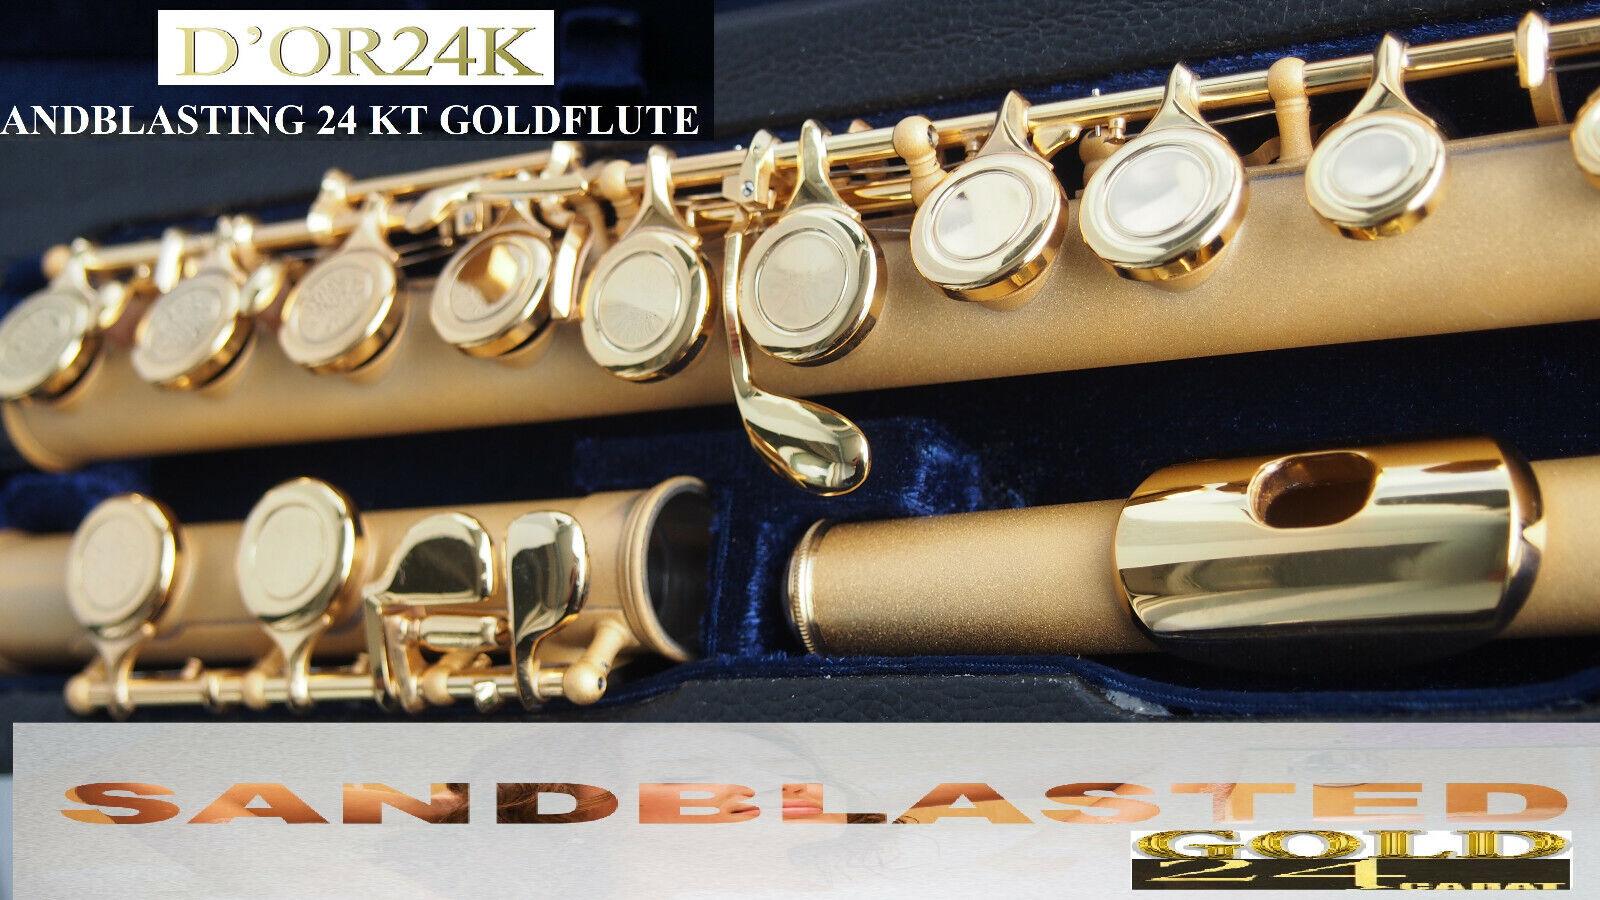 Flute Gold sandbla Querflöte  24 Kt 999  Fingold sandgestrahlt  Flauto de Or